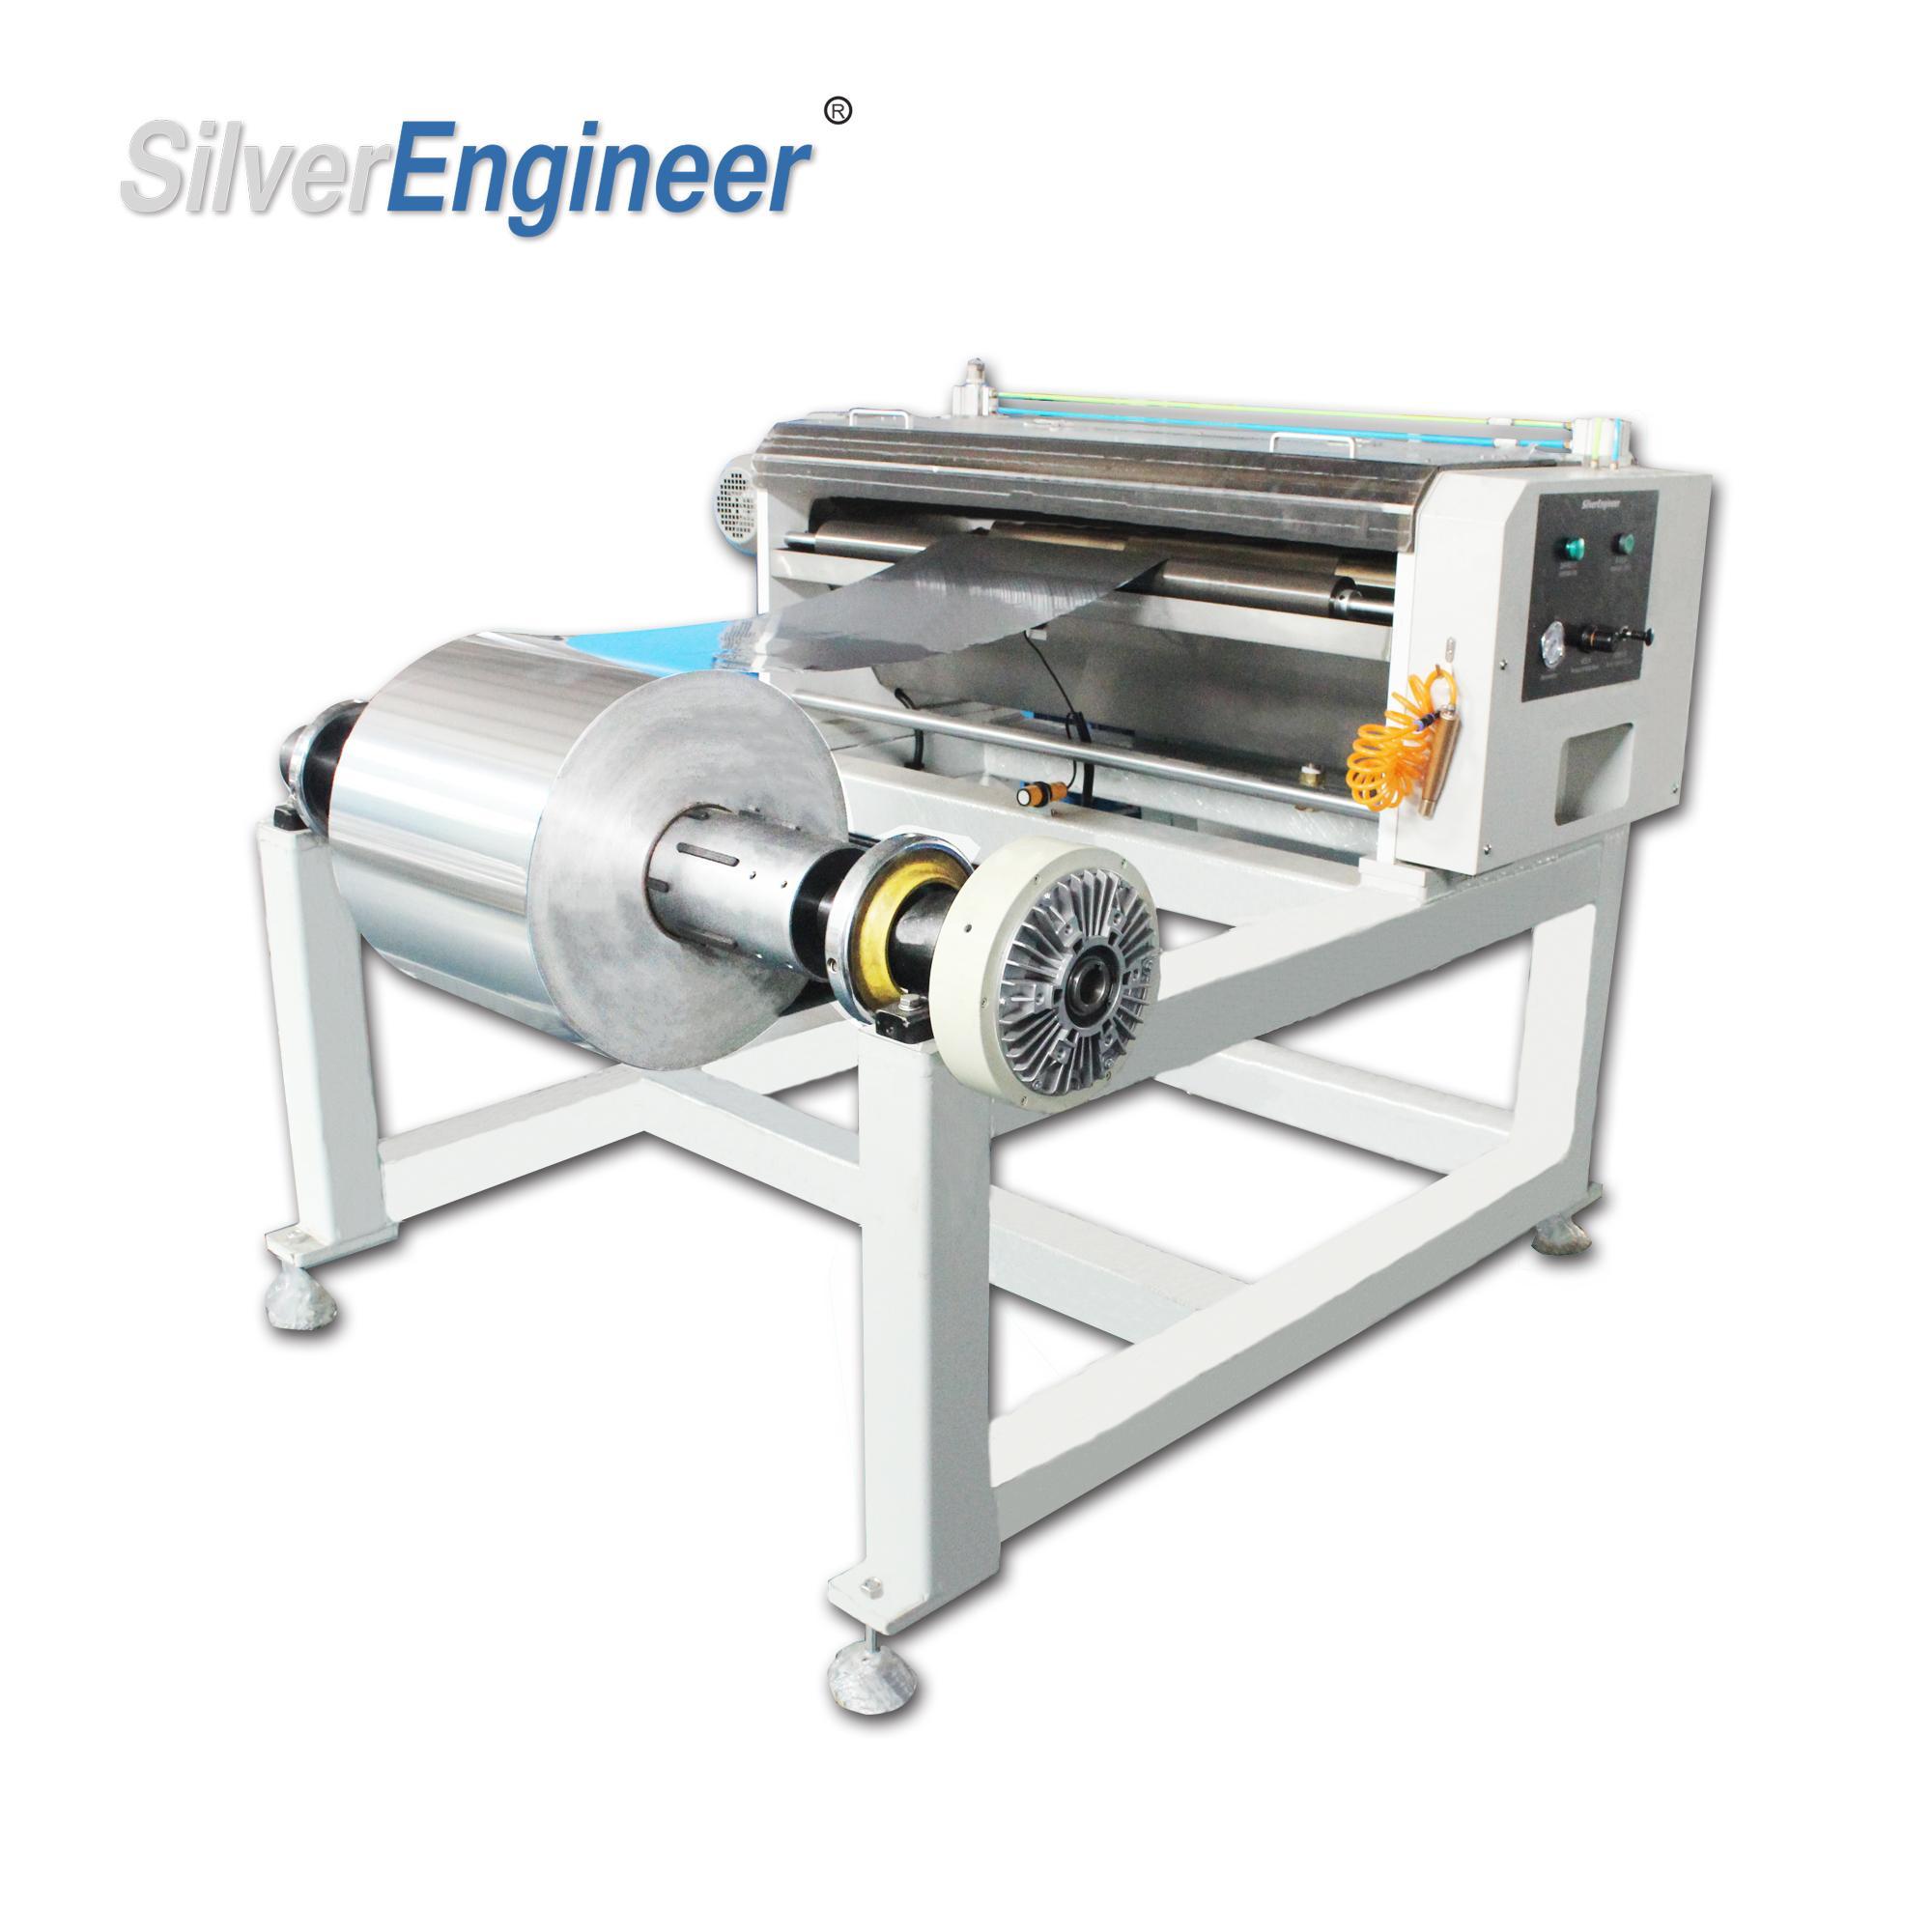 Aluminium Foil Container Making Machine From Silverengineer 3